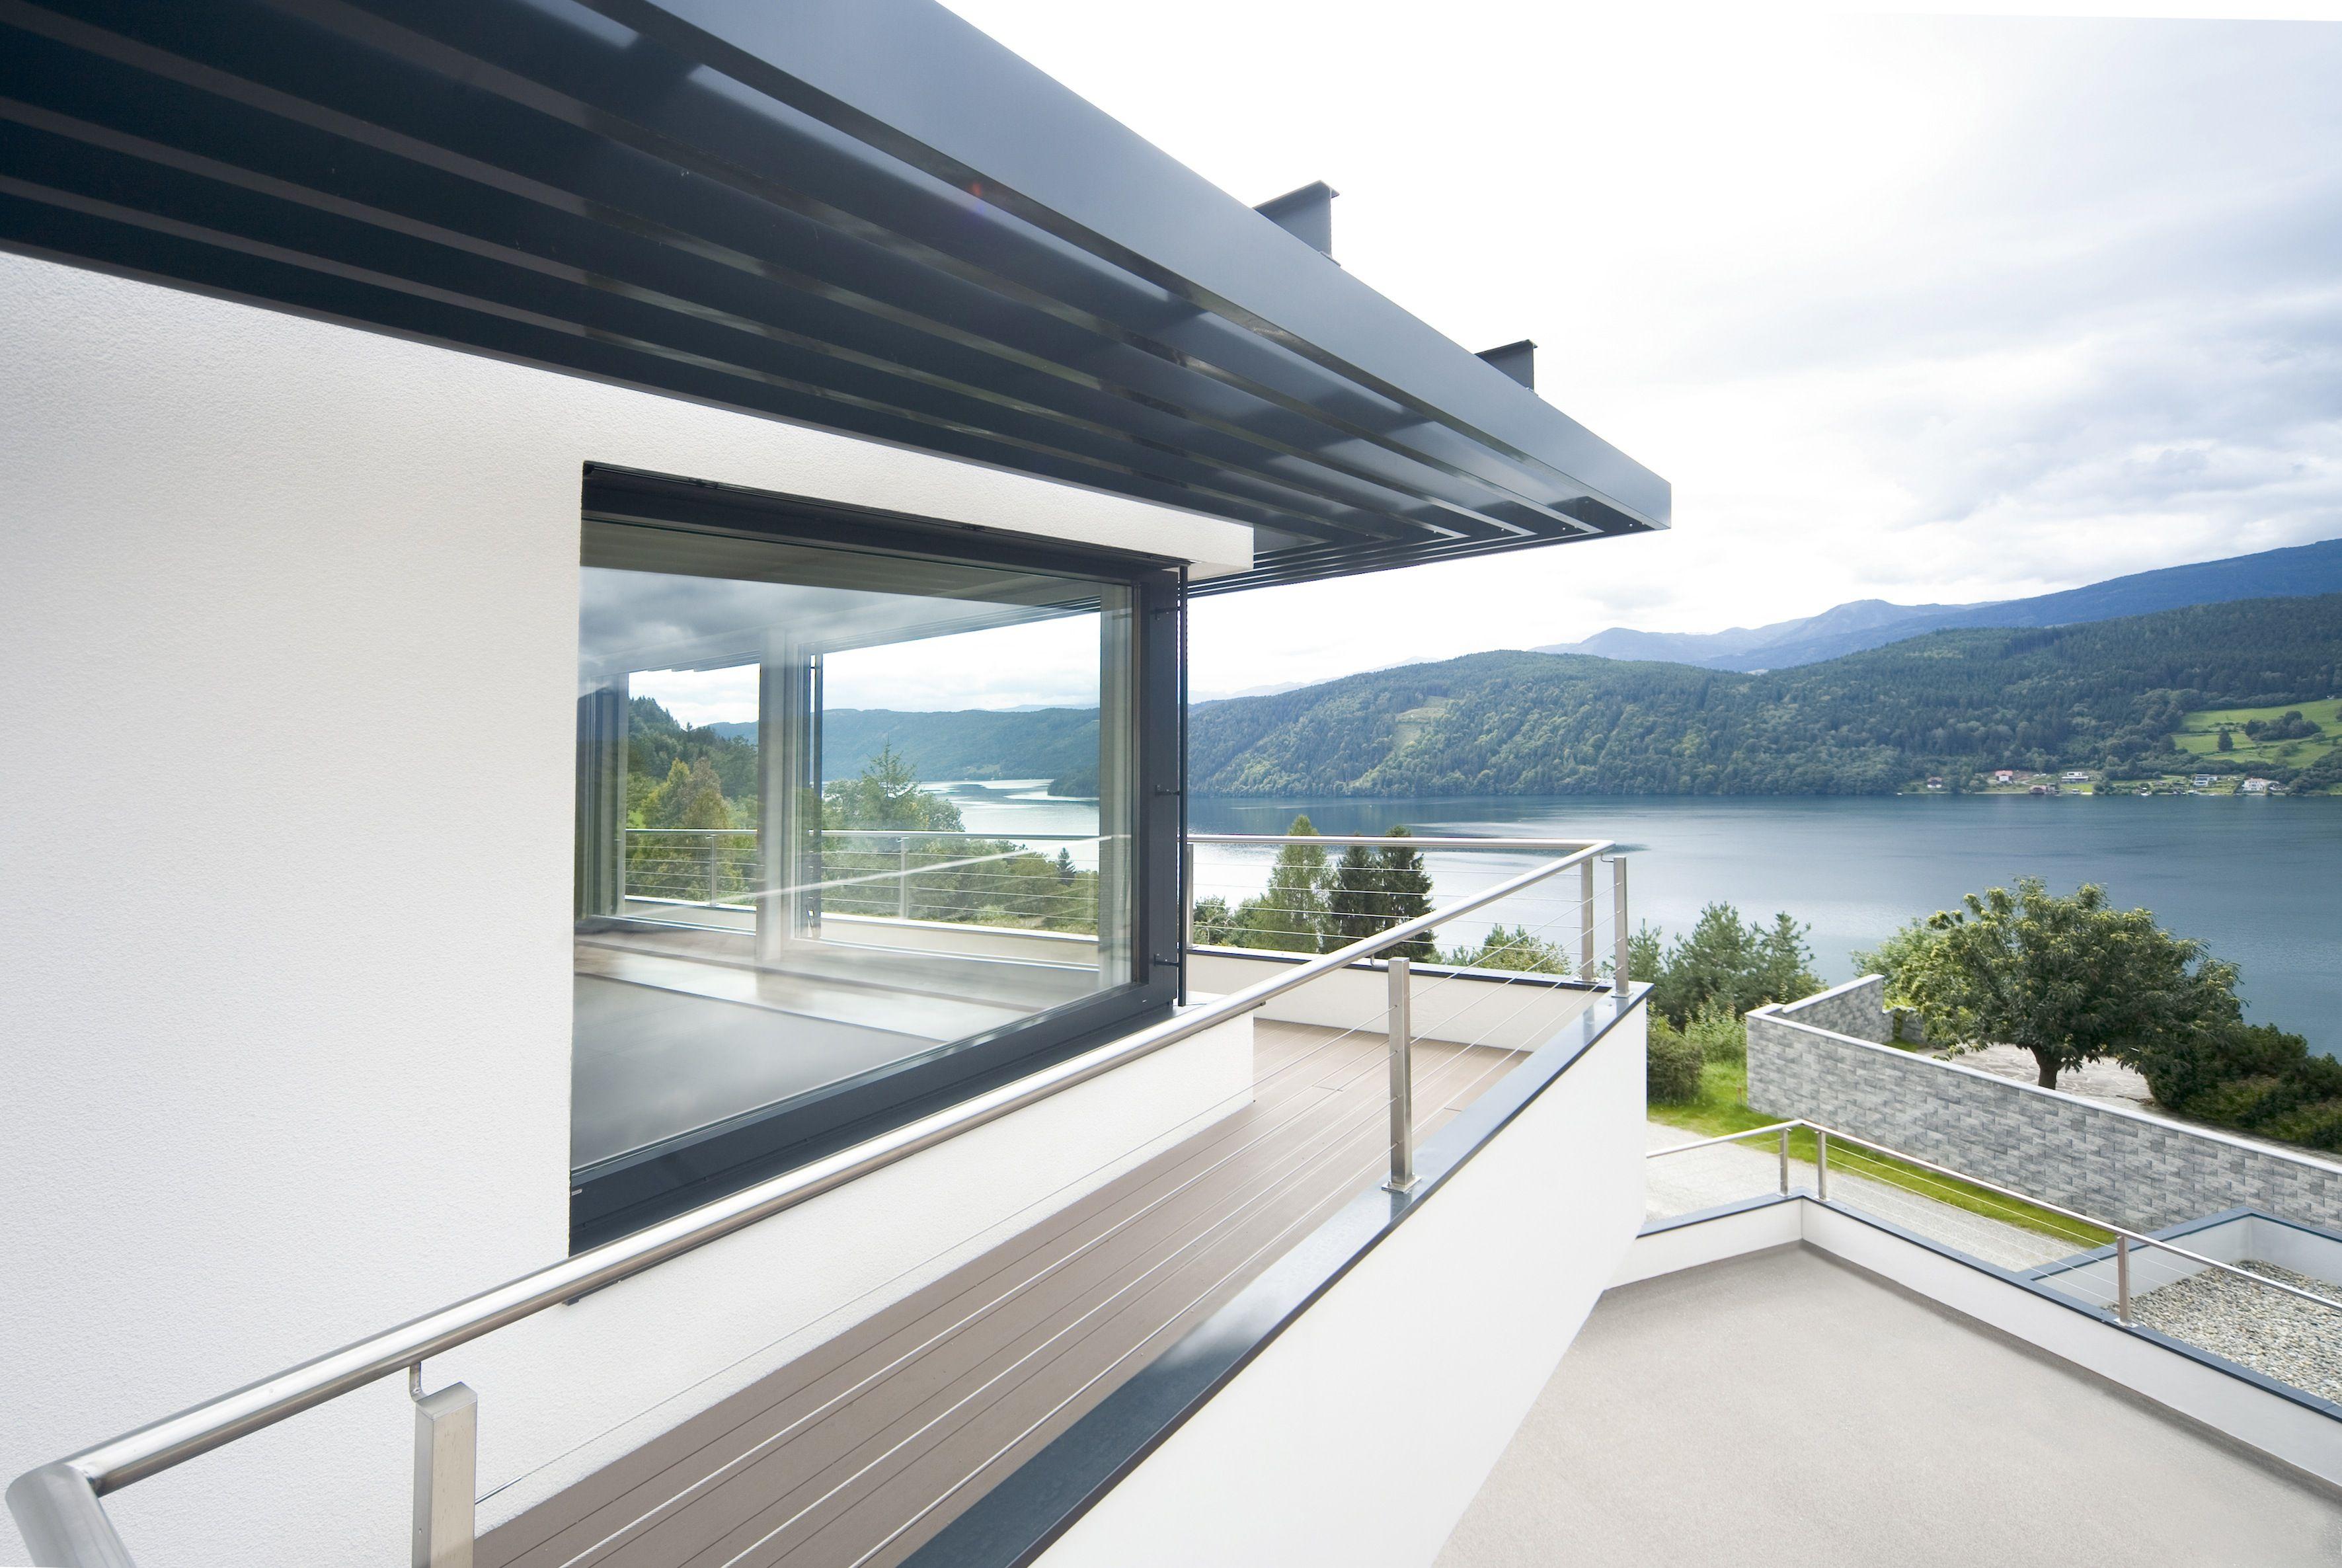 Kunststoff/Aluminium-Fenster KF 405. Fotocredit: Internorm ...